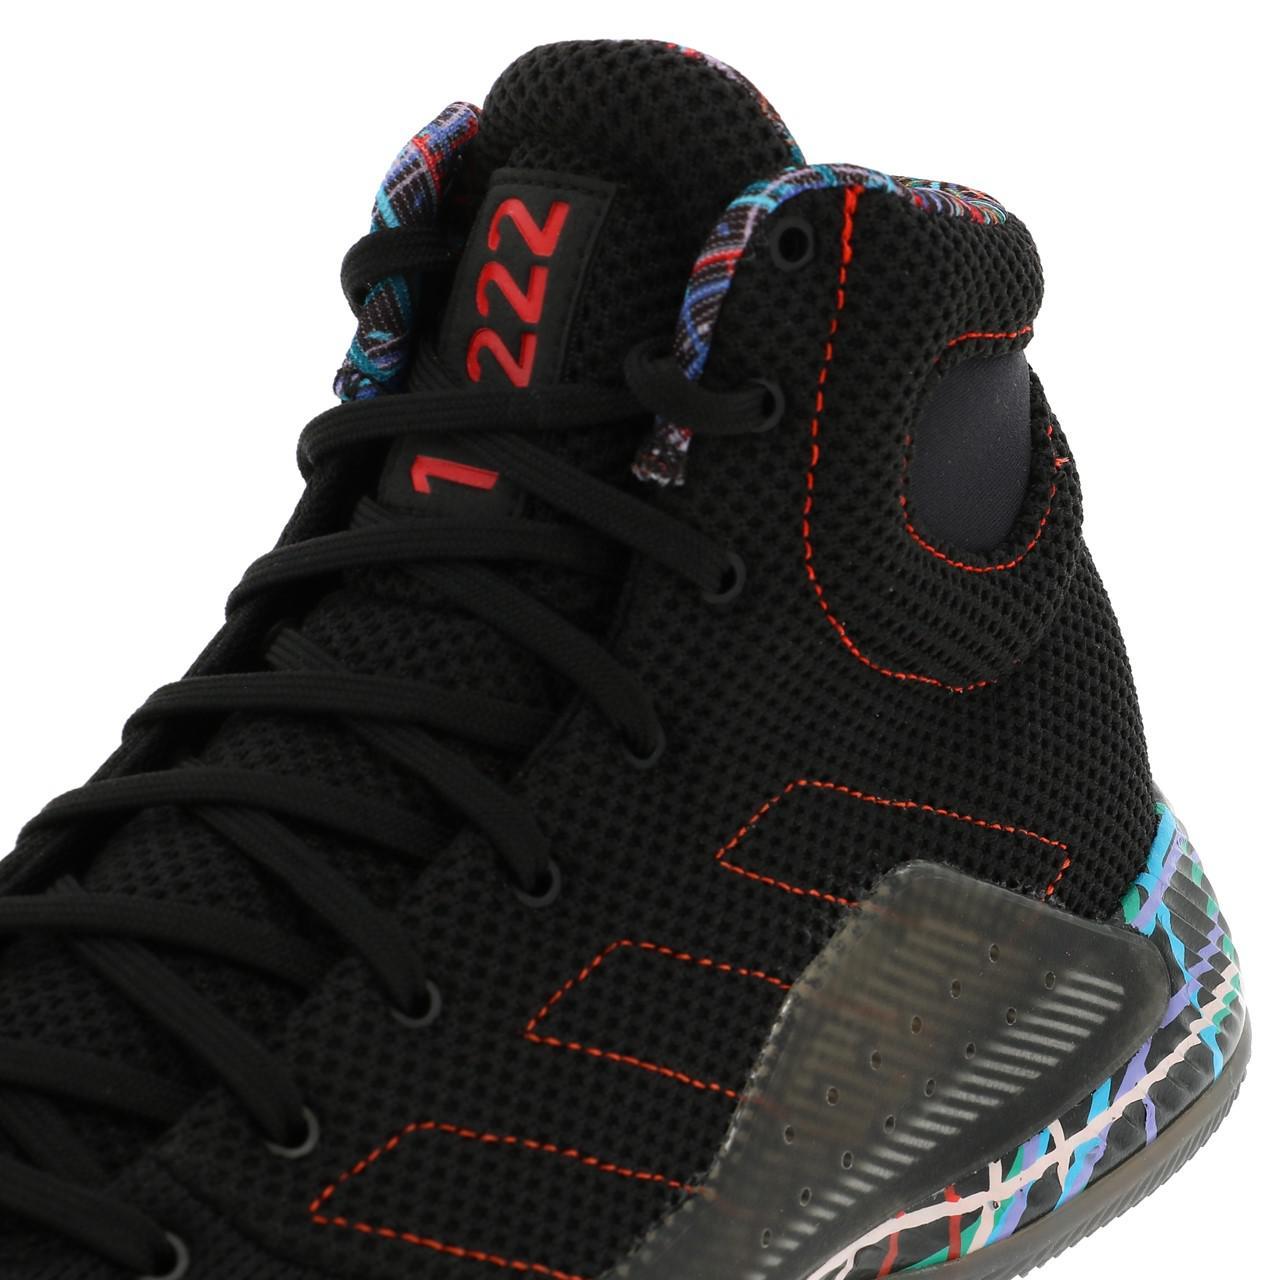 Chaussures-basket-Adidas-Pro-bounce-madness-basket-Noir-55022-Neuf miniature 2